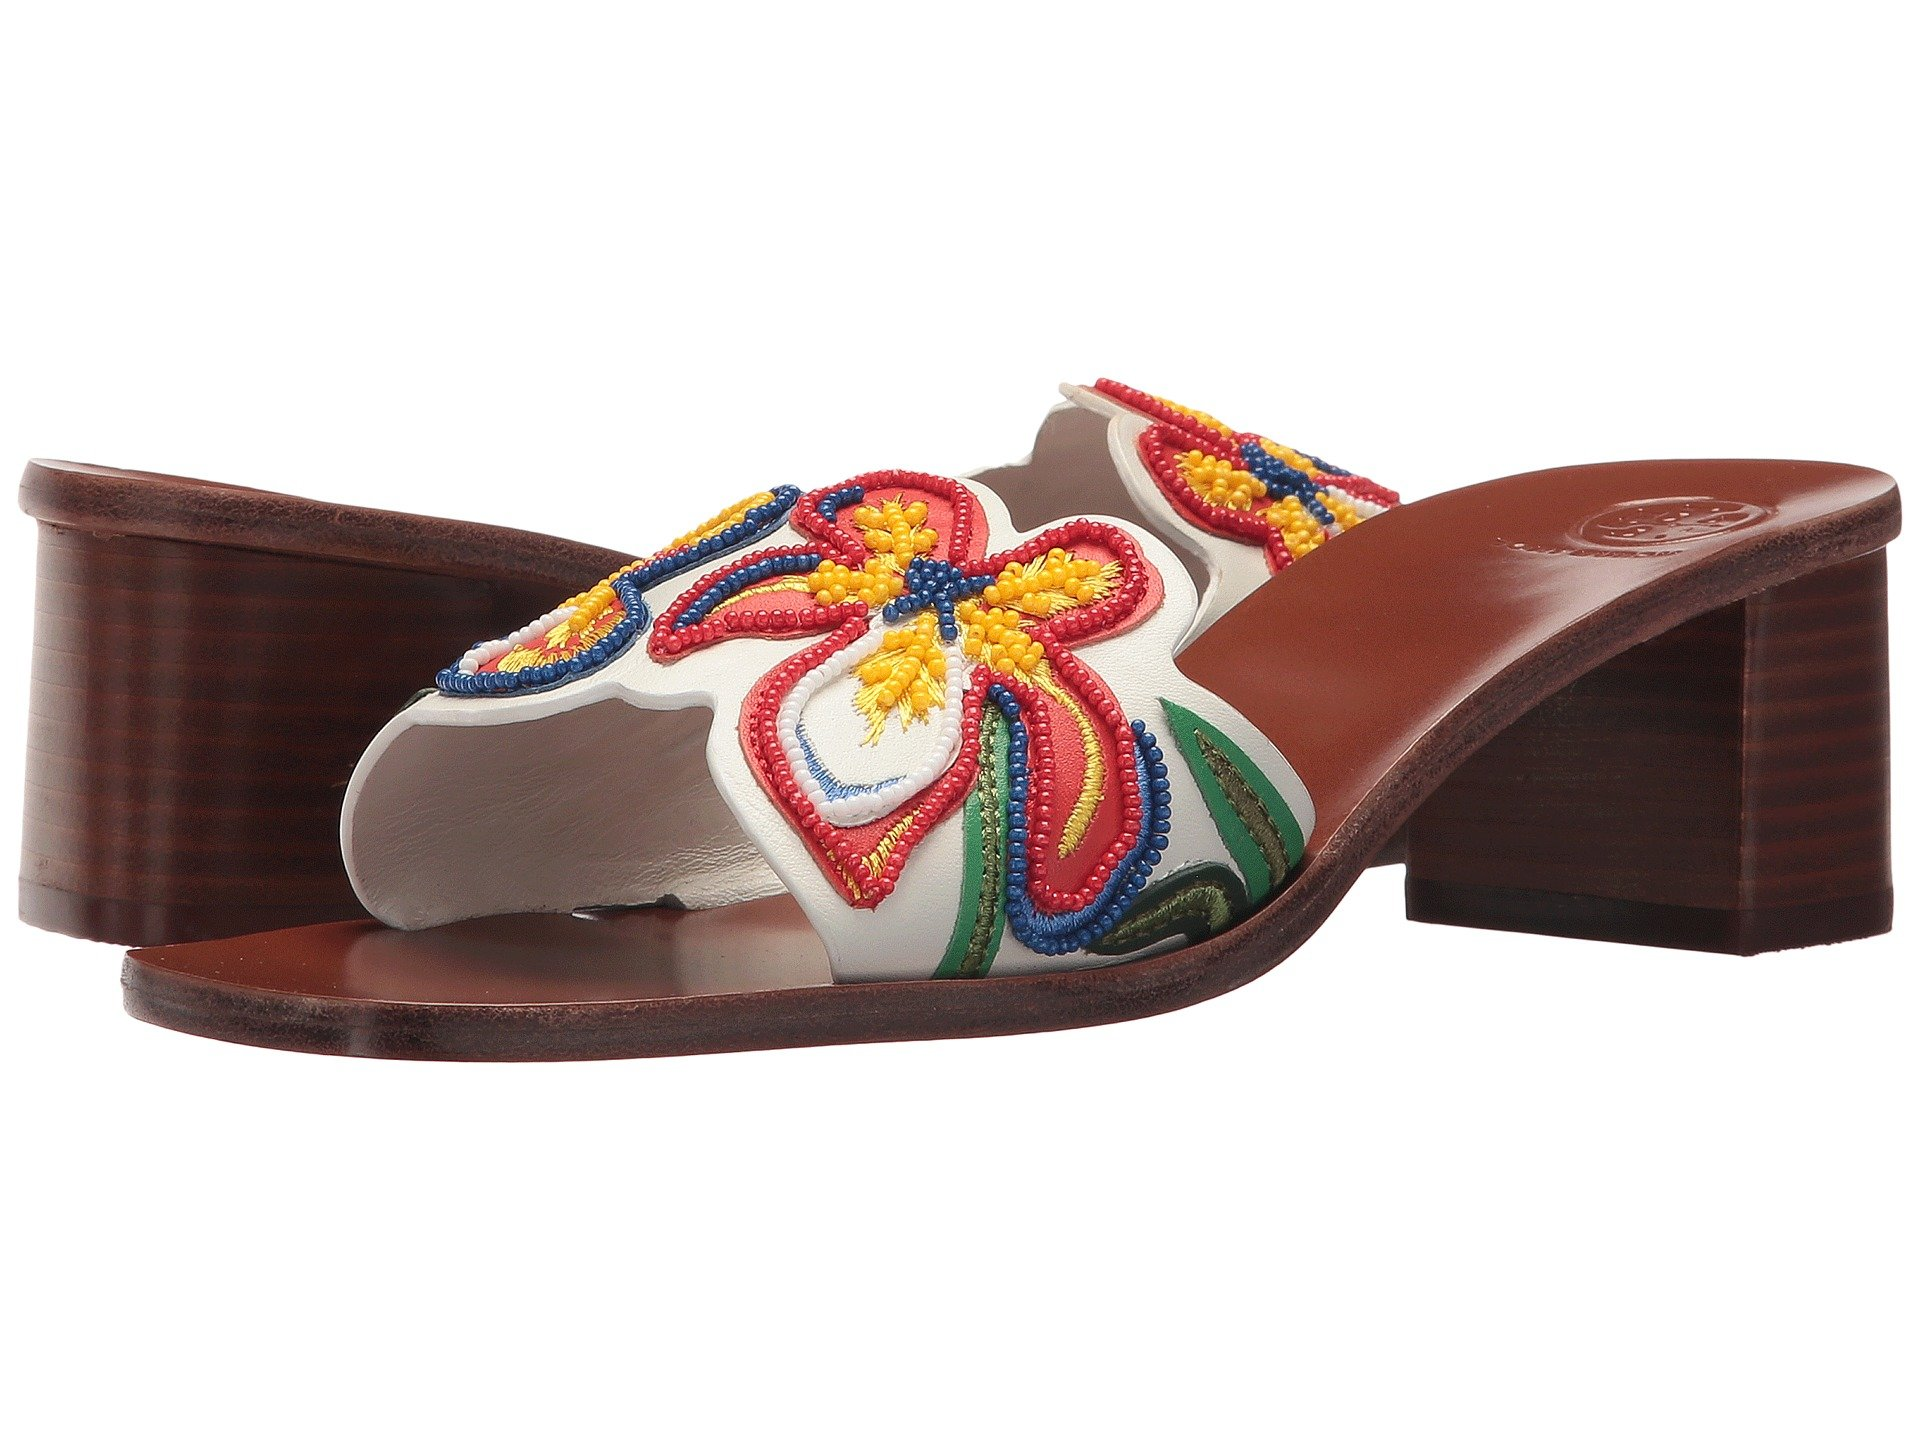 Shoes Shipped FREE